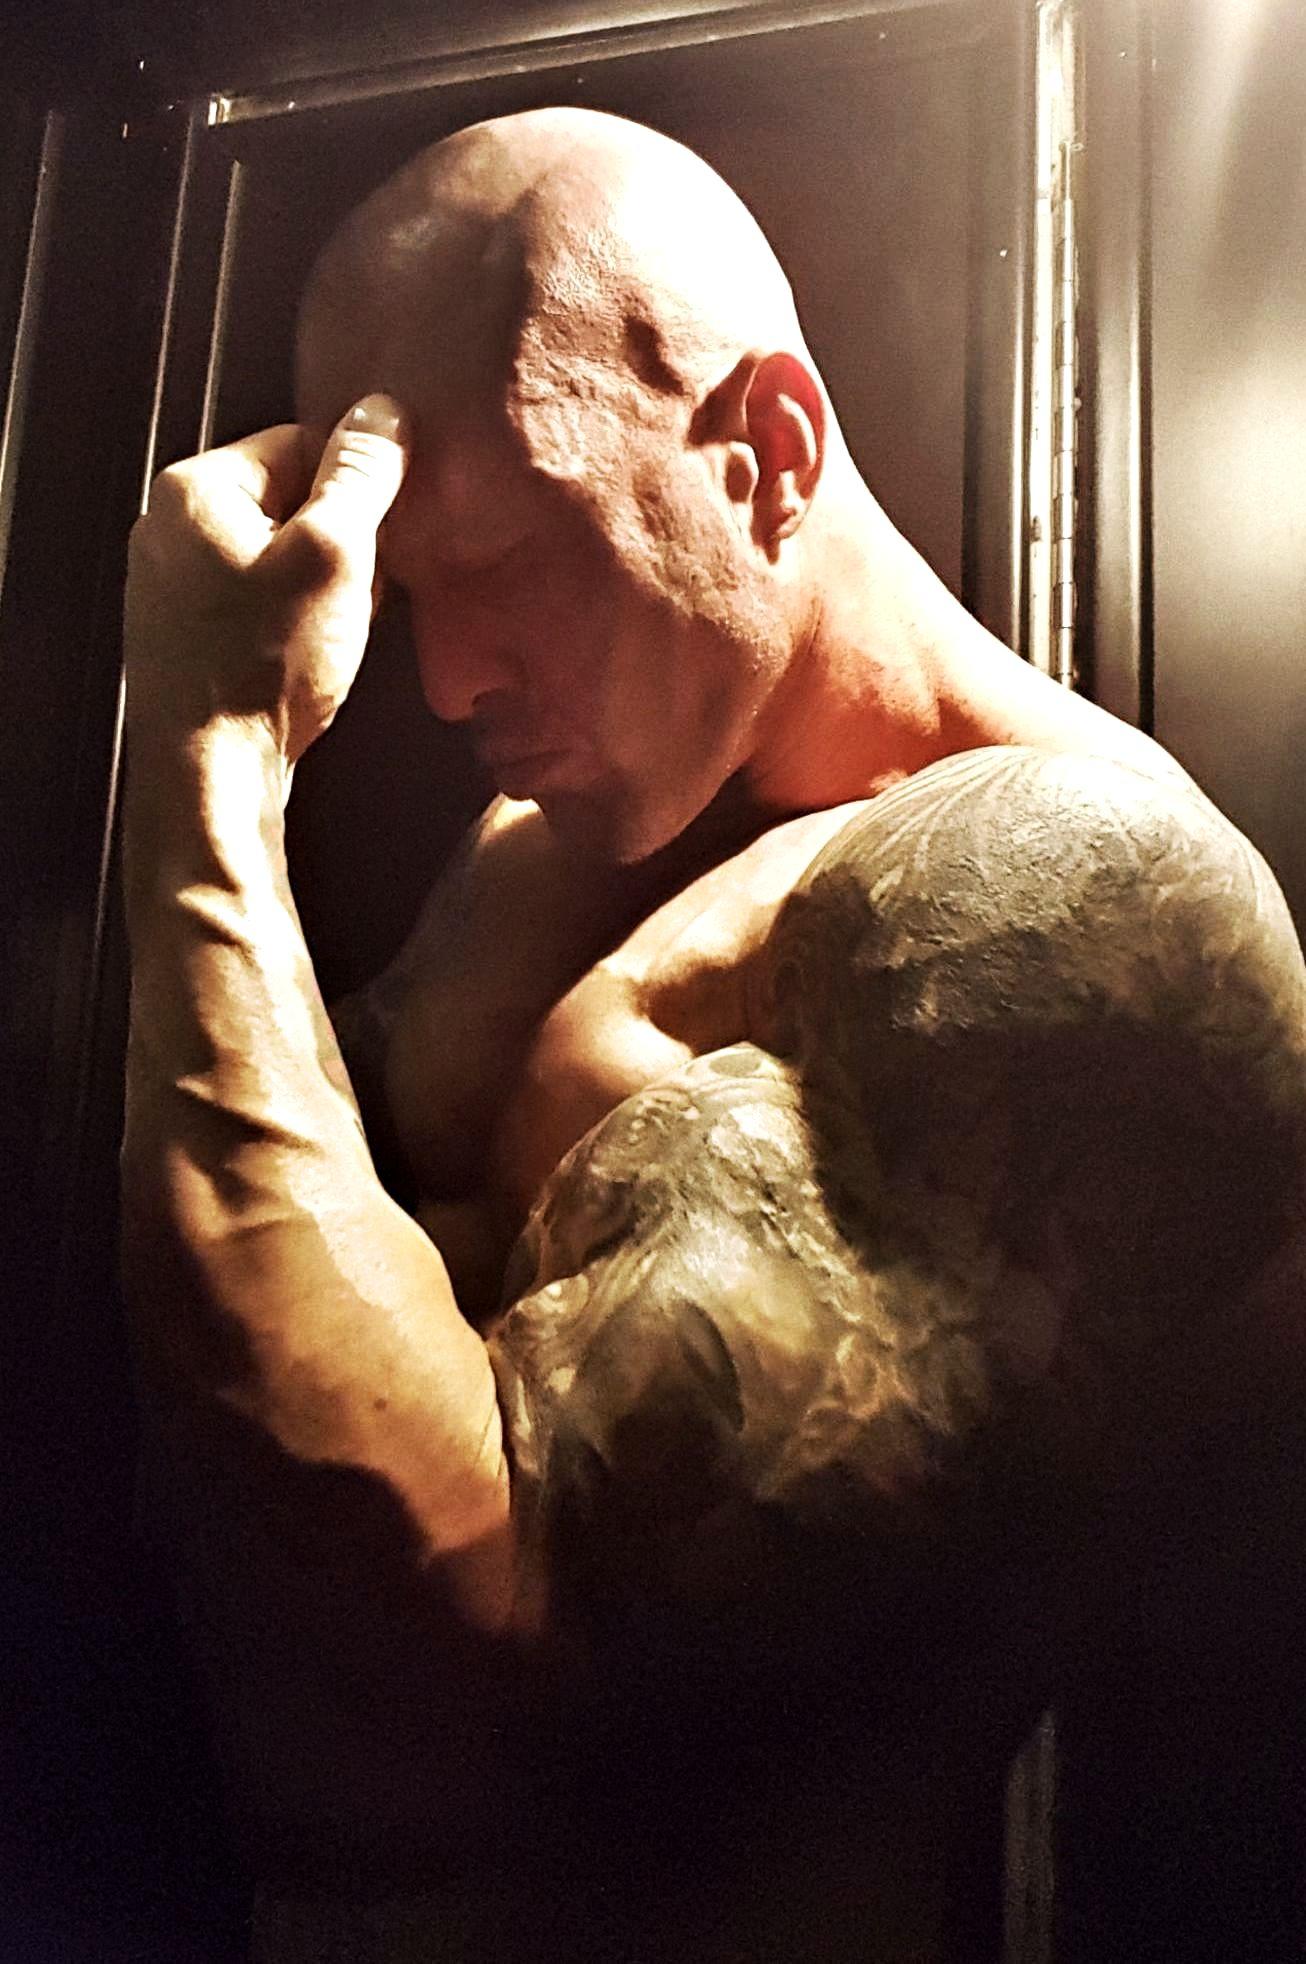 Actor & Tattooed Physique Cover Model John Joseph Quinlan 4-28-2016 #JohnQuinlan